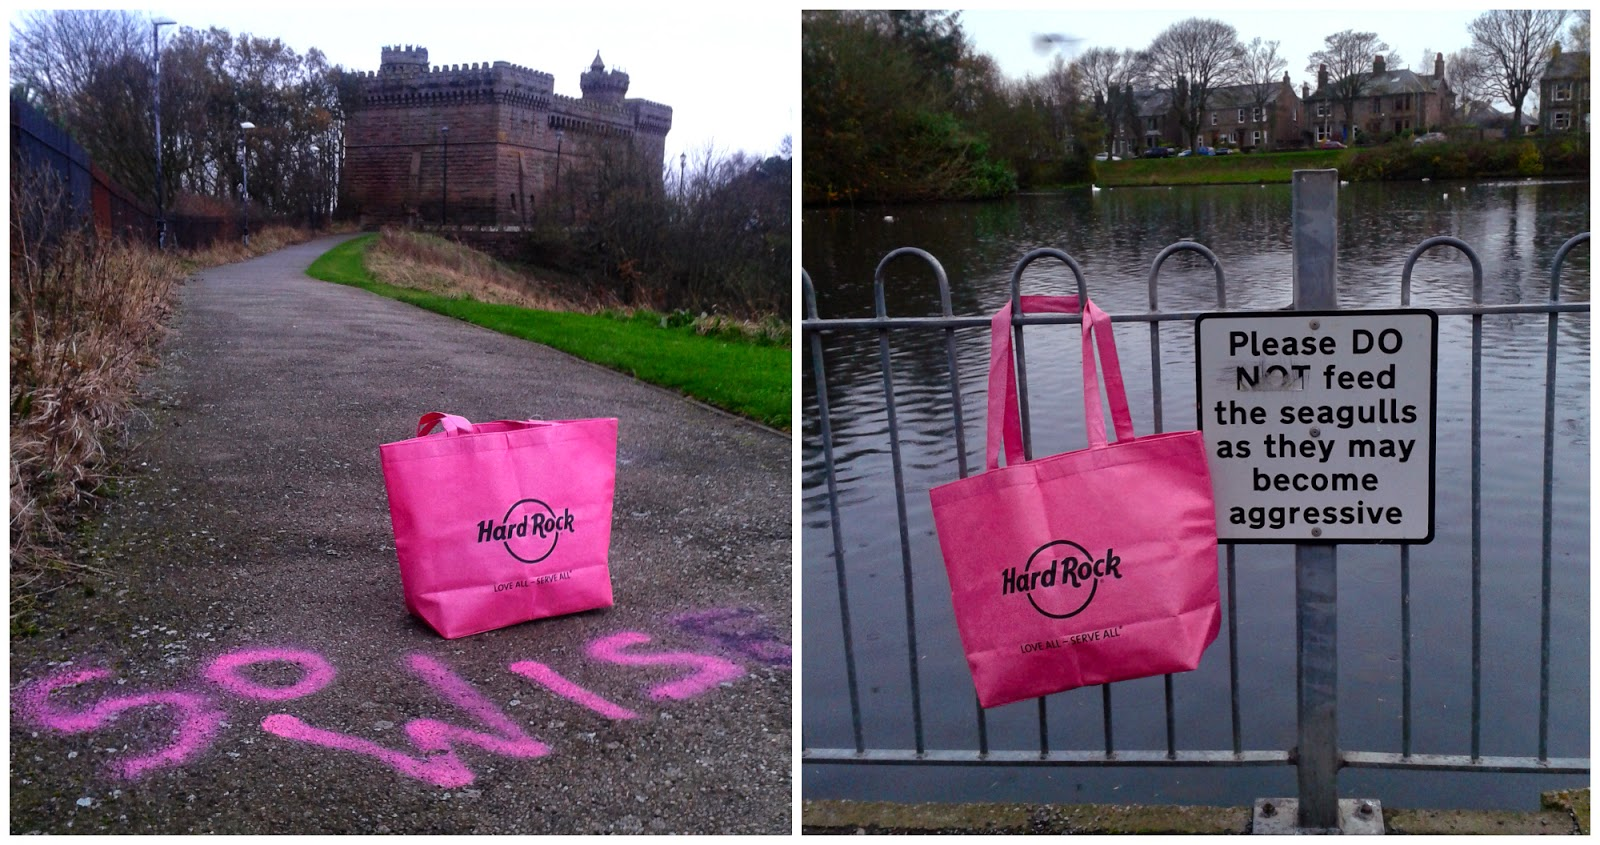 Hard Rock Cafe, Hard Rock Edinburgh, Blogger Event, Scottish Bloggers, Edinburgh bloggers, pinktober, #pinktober, Hard Rock bag, pink bag, Arbroath